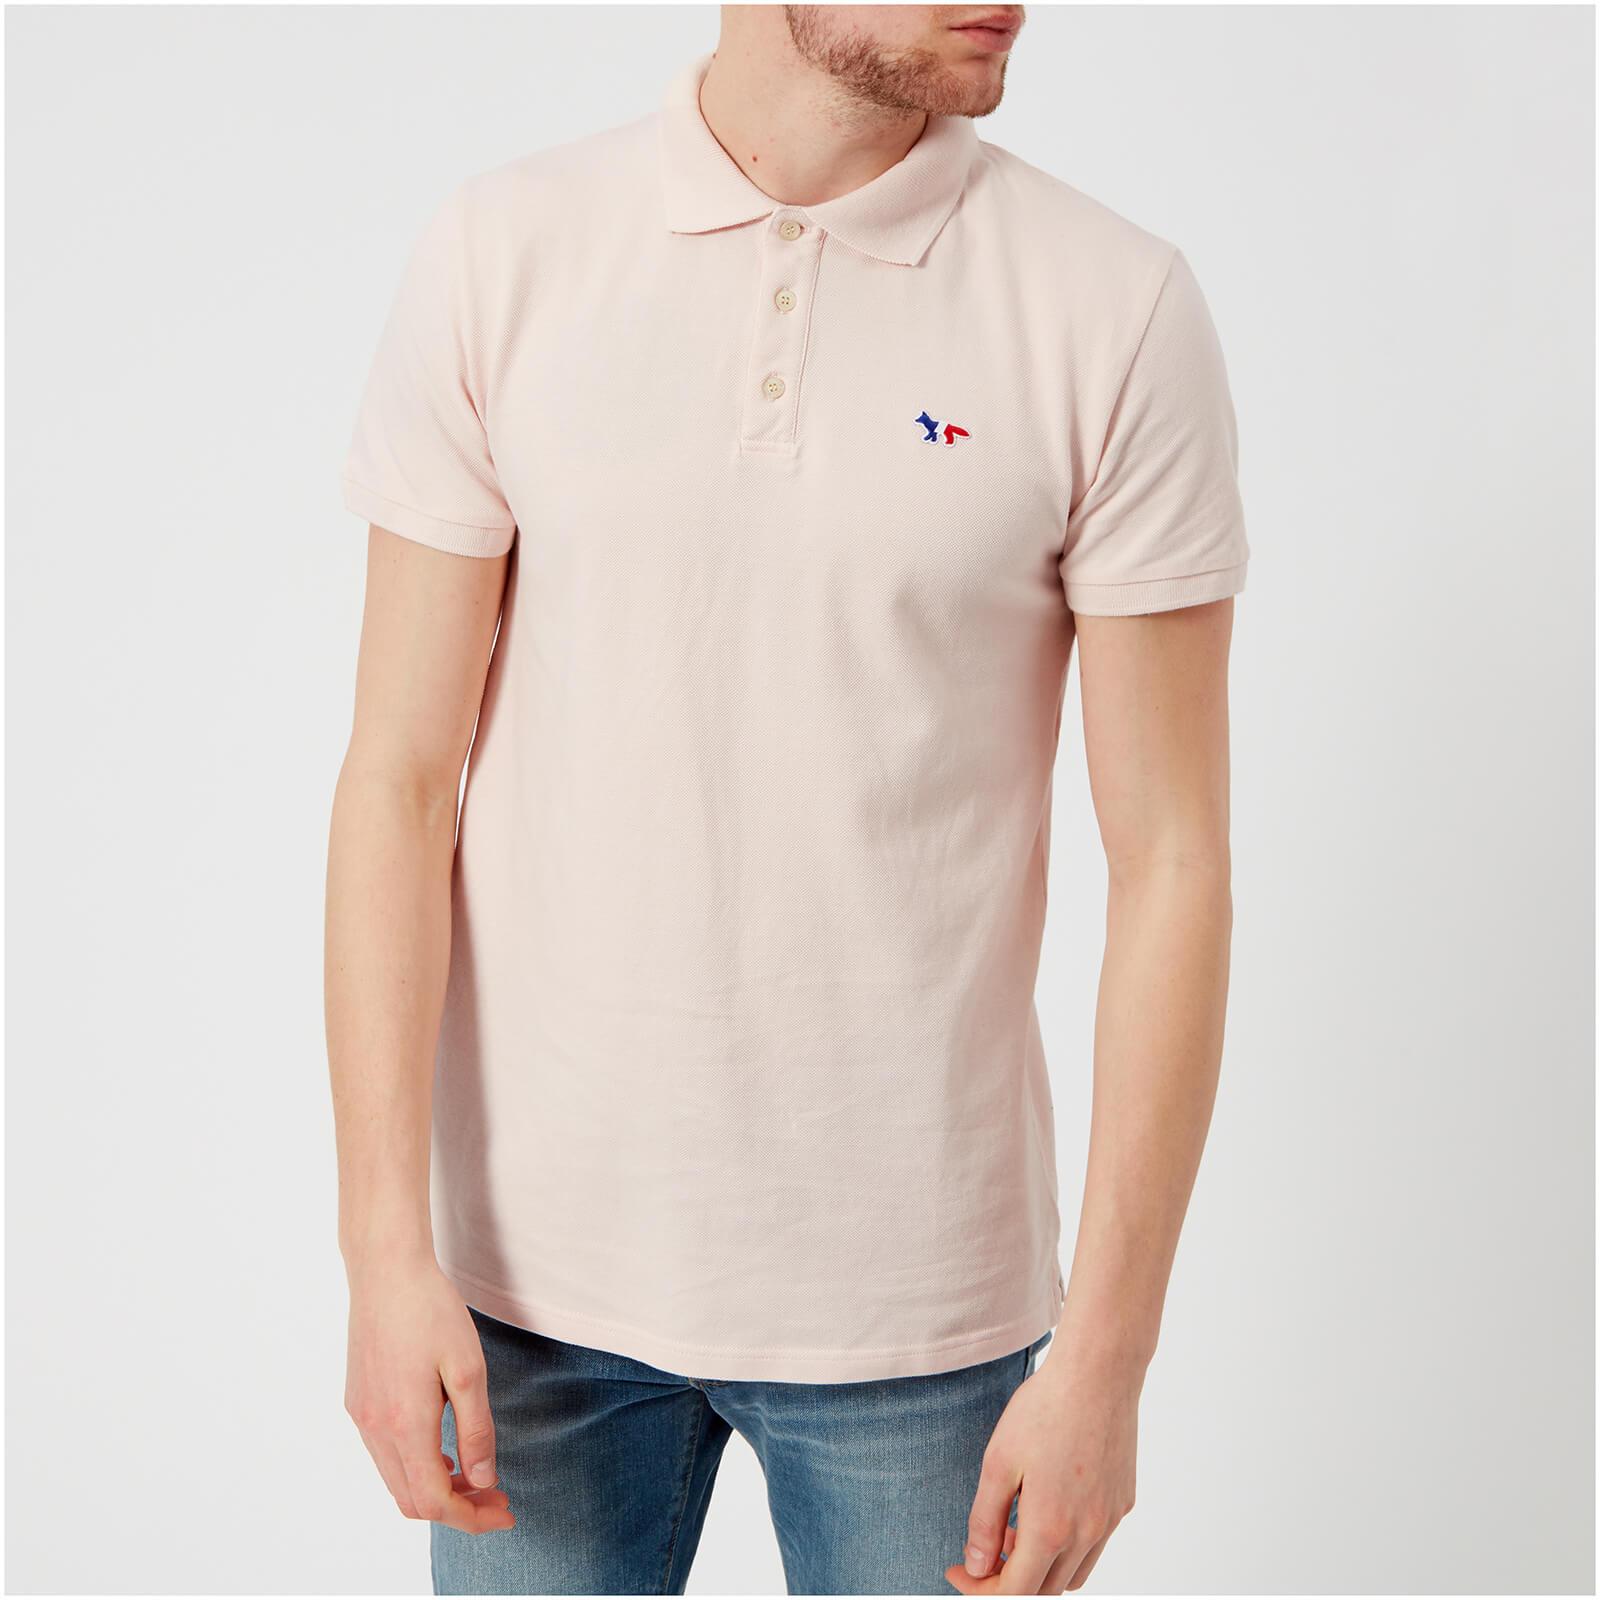 61cd91dc957b Maison Kitsuné Men s Tricolor Fox Patch Polo Shirt - Pink - Free UK ...